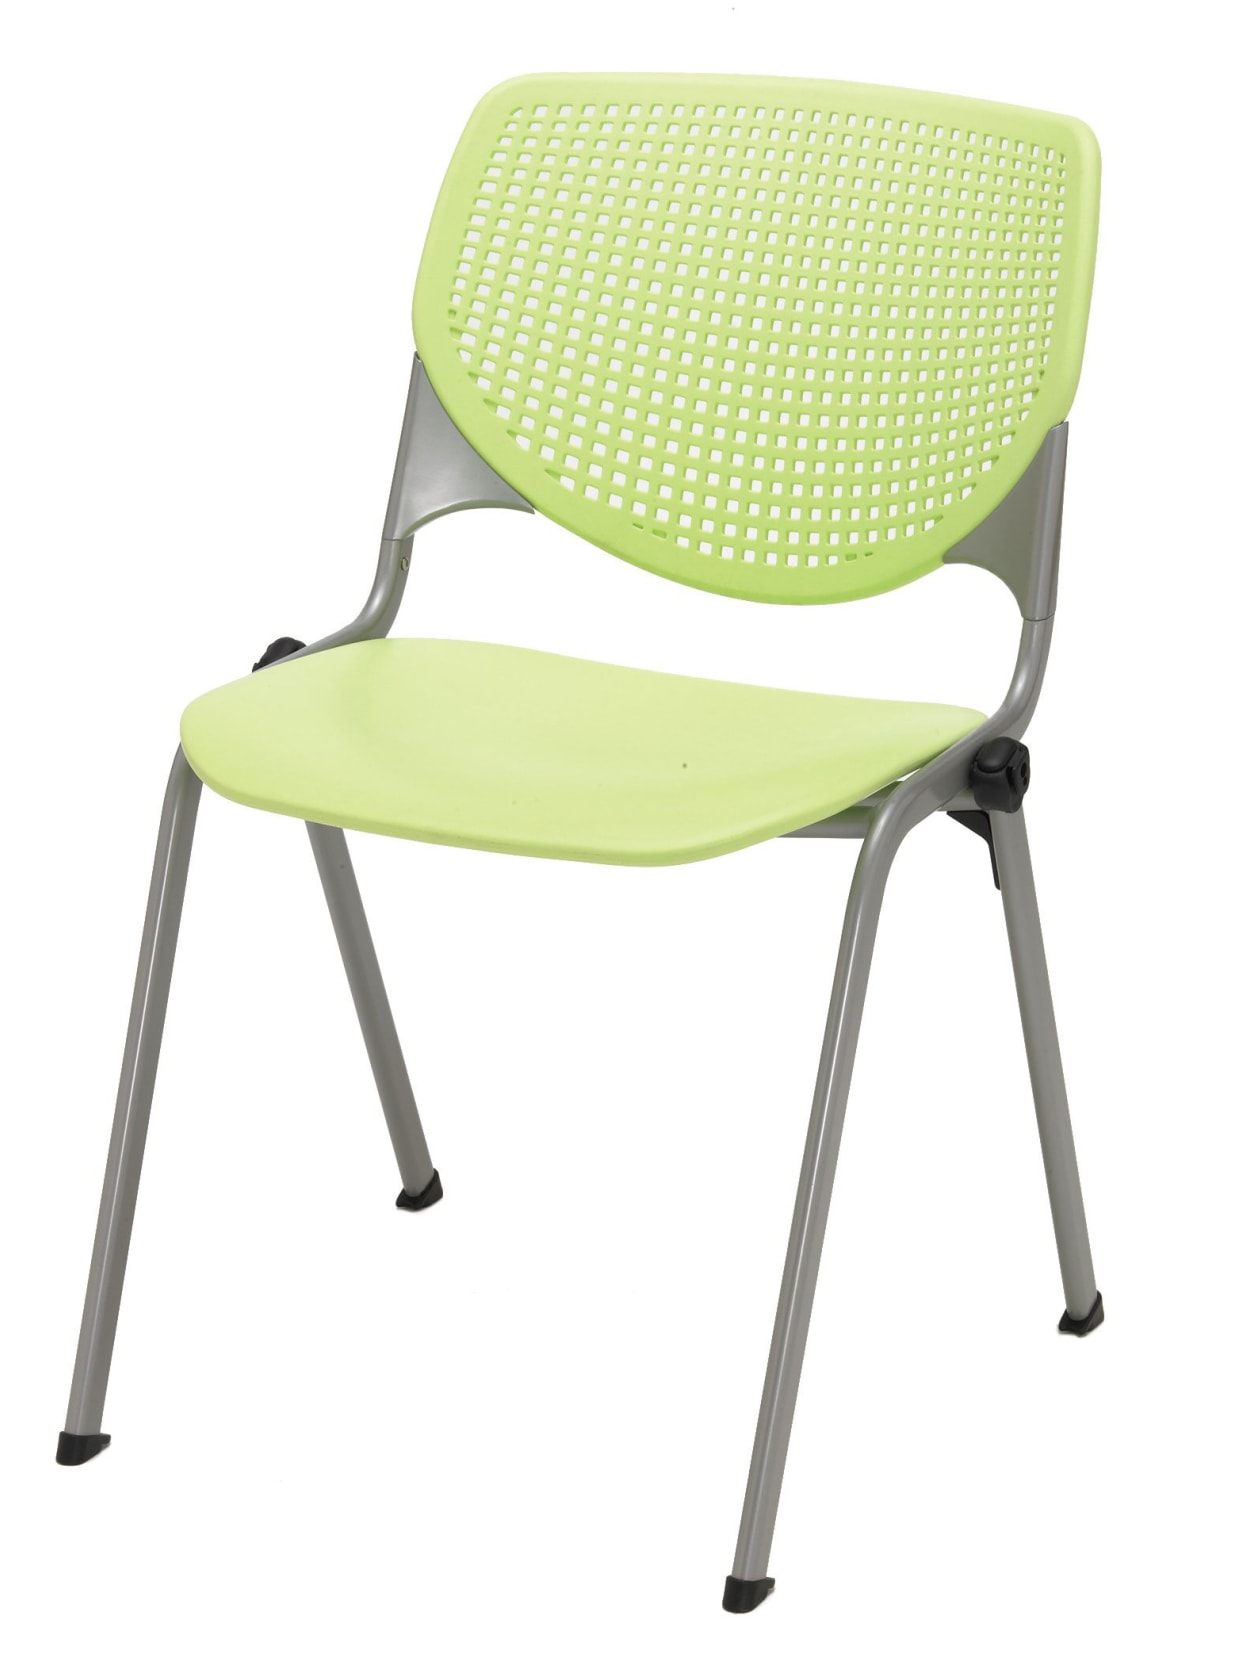 KFI Studios KOOL Stacking Chair, Lime Green/Silver Item # 50